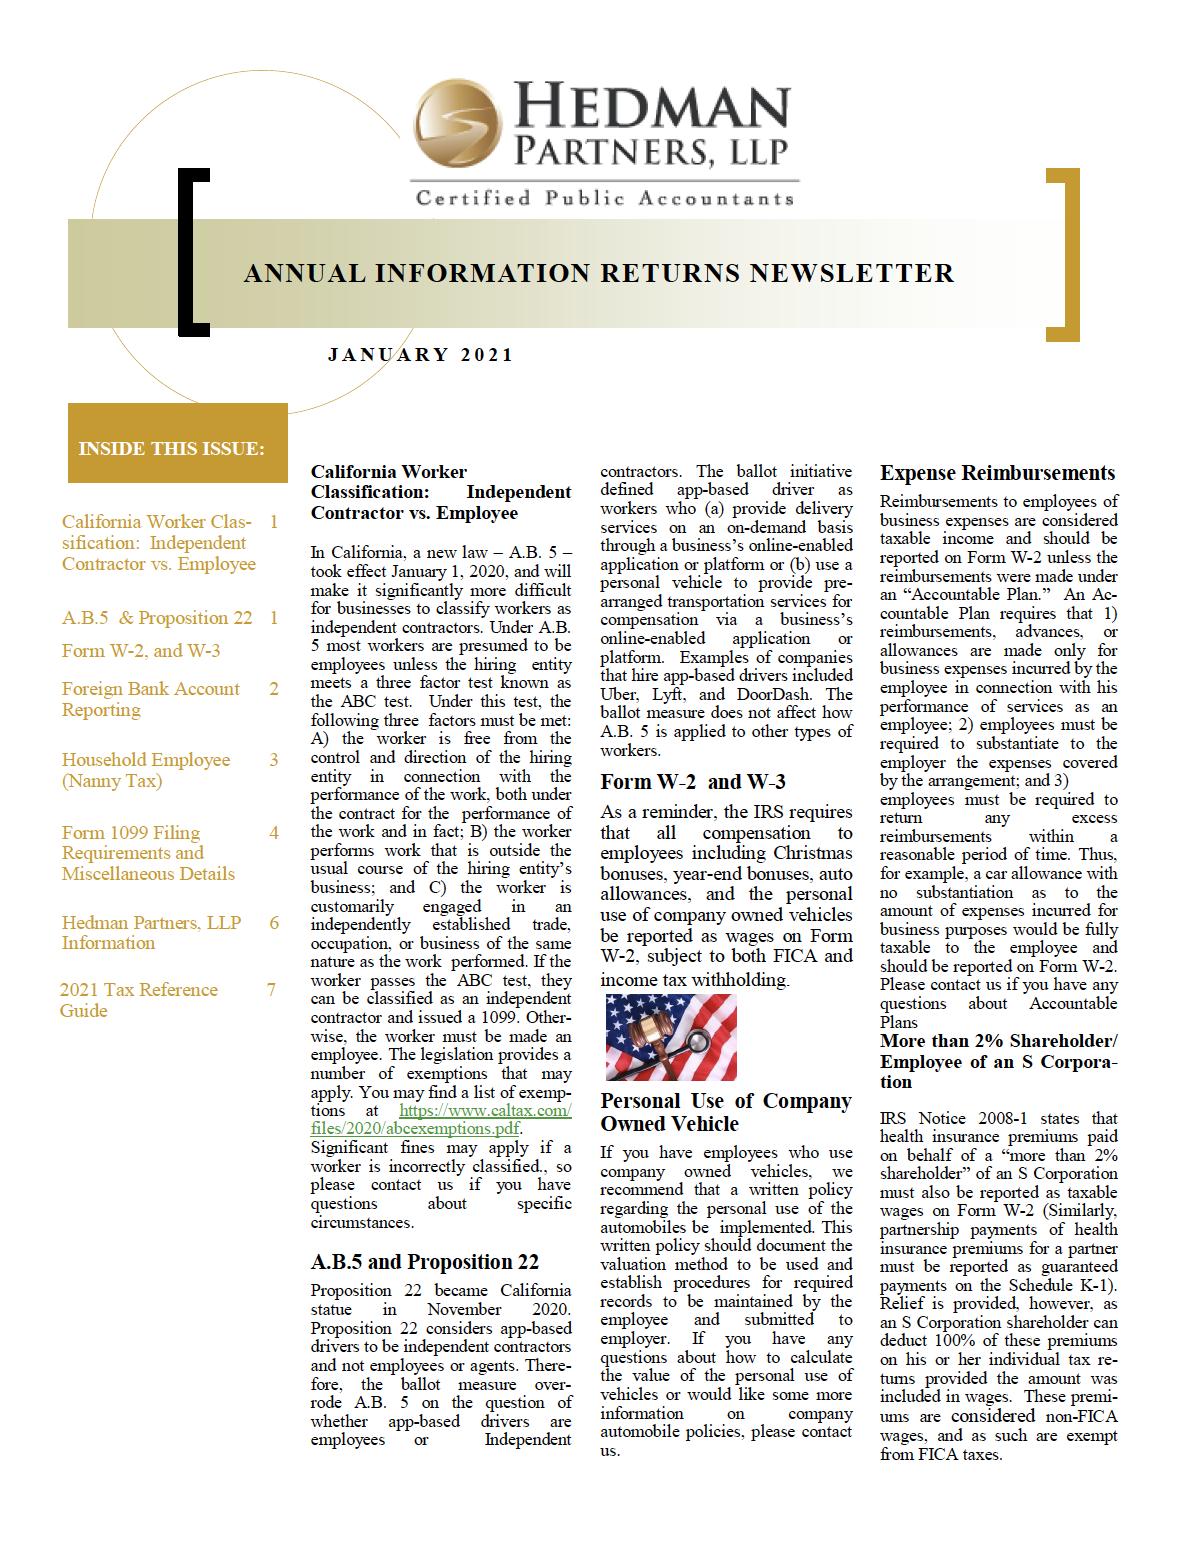 2021 Annual Information Returns Newsletter